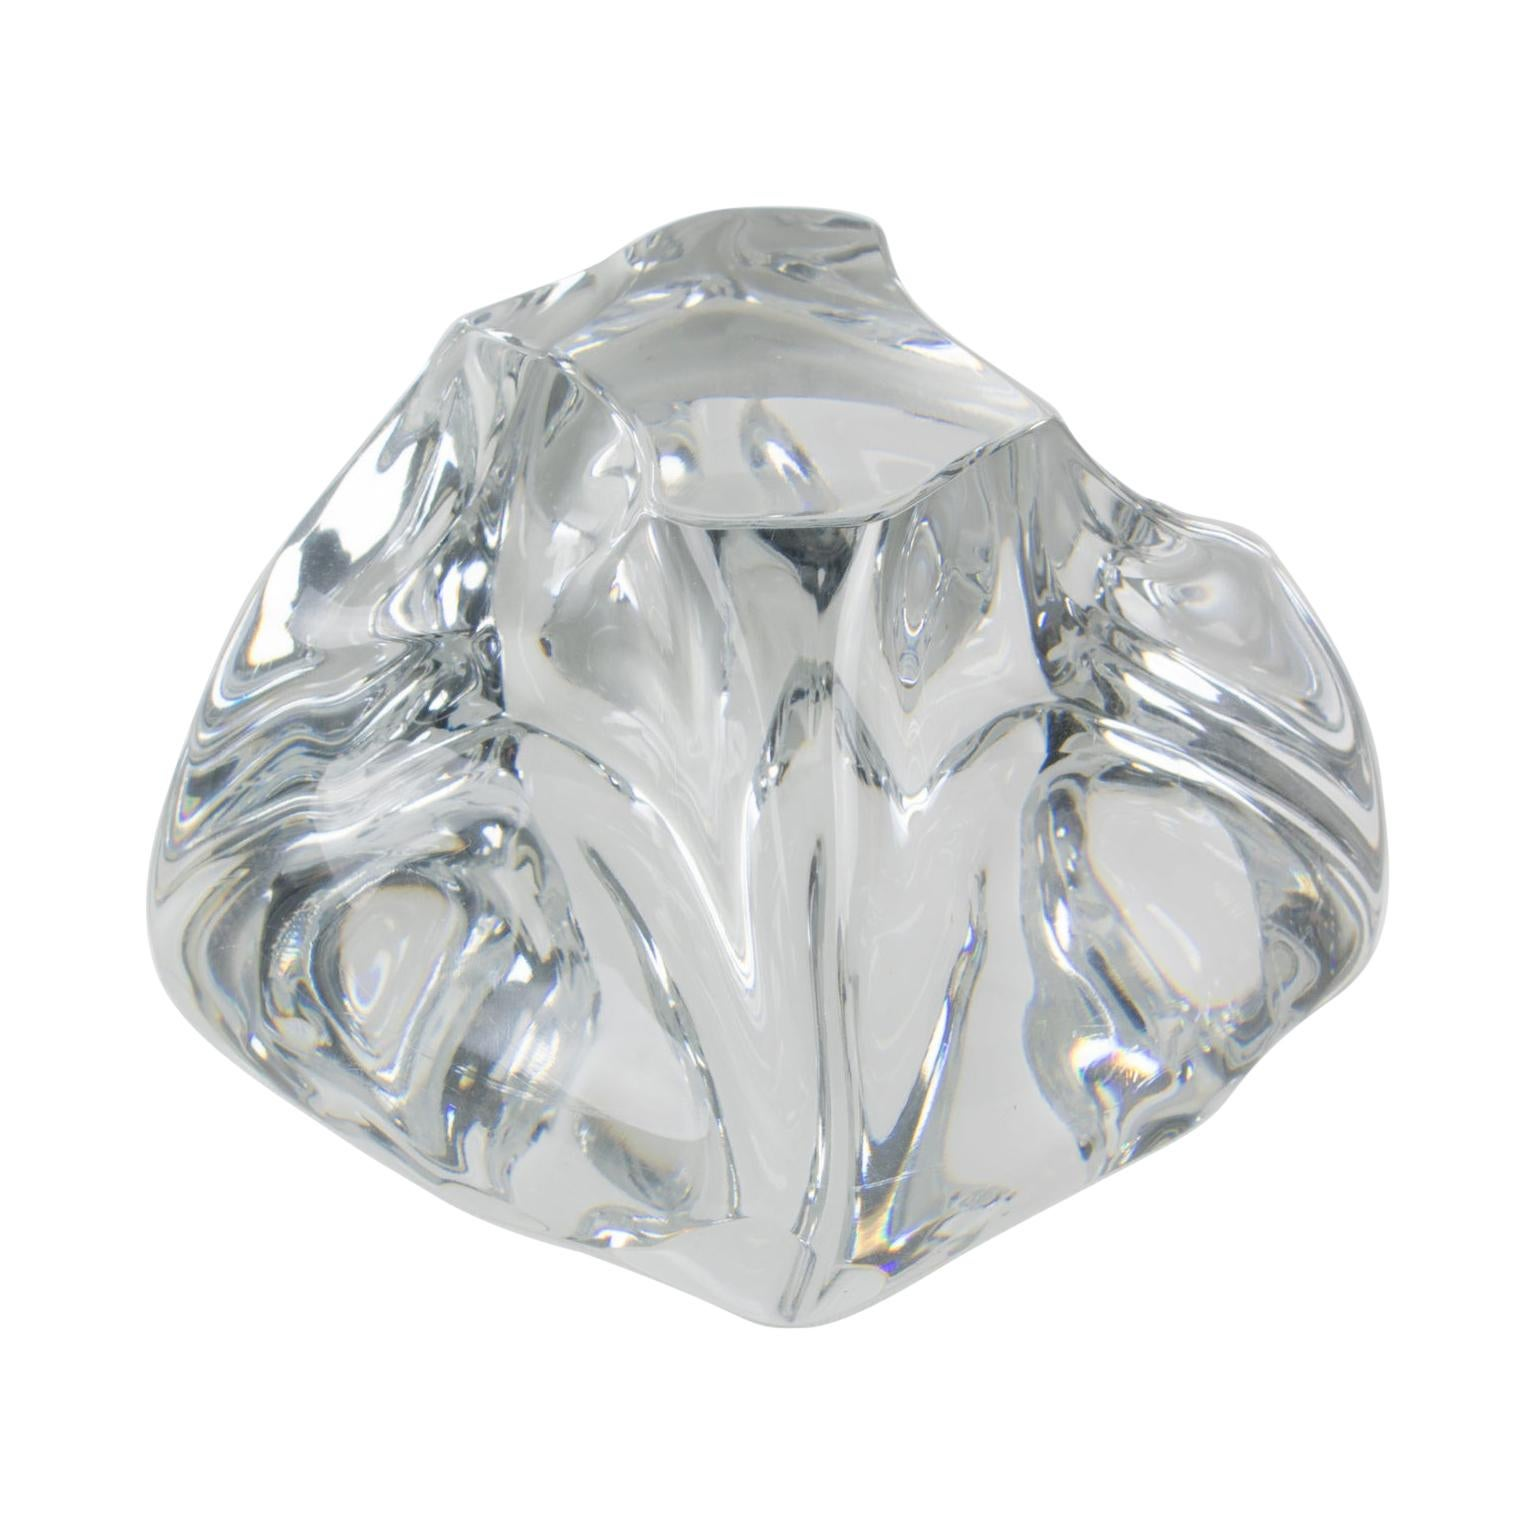 Daum France Crystal Paperweight Sculpture